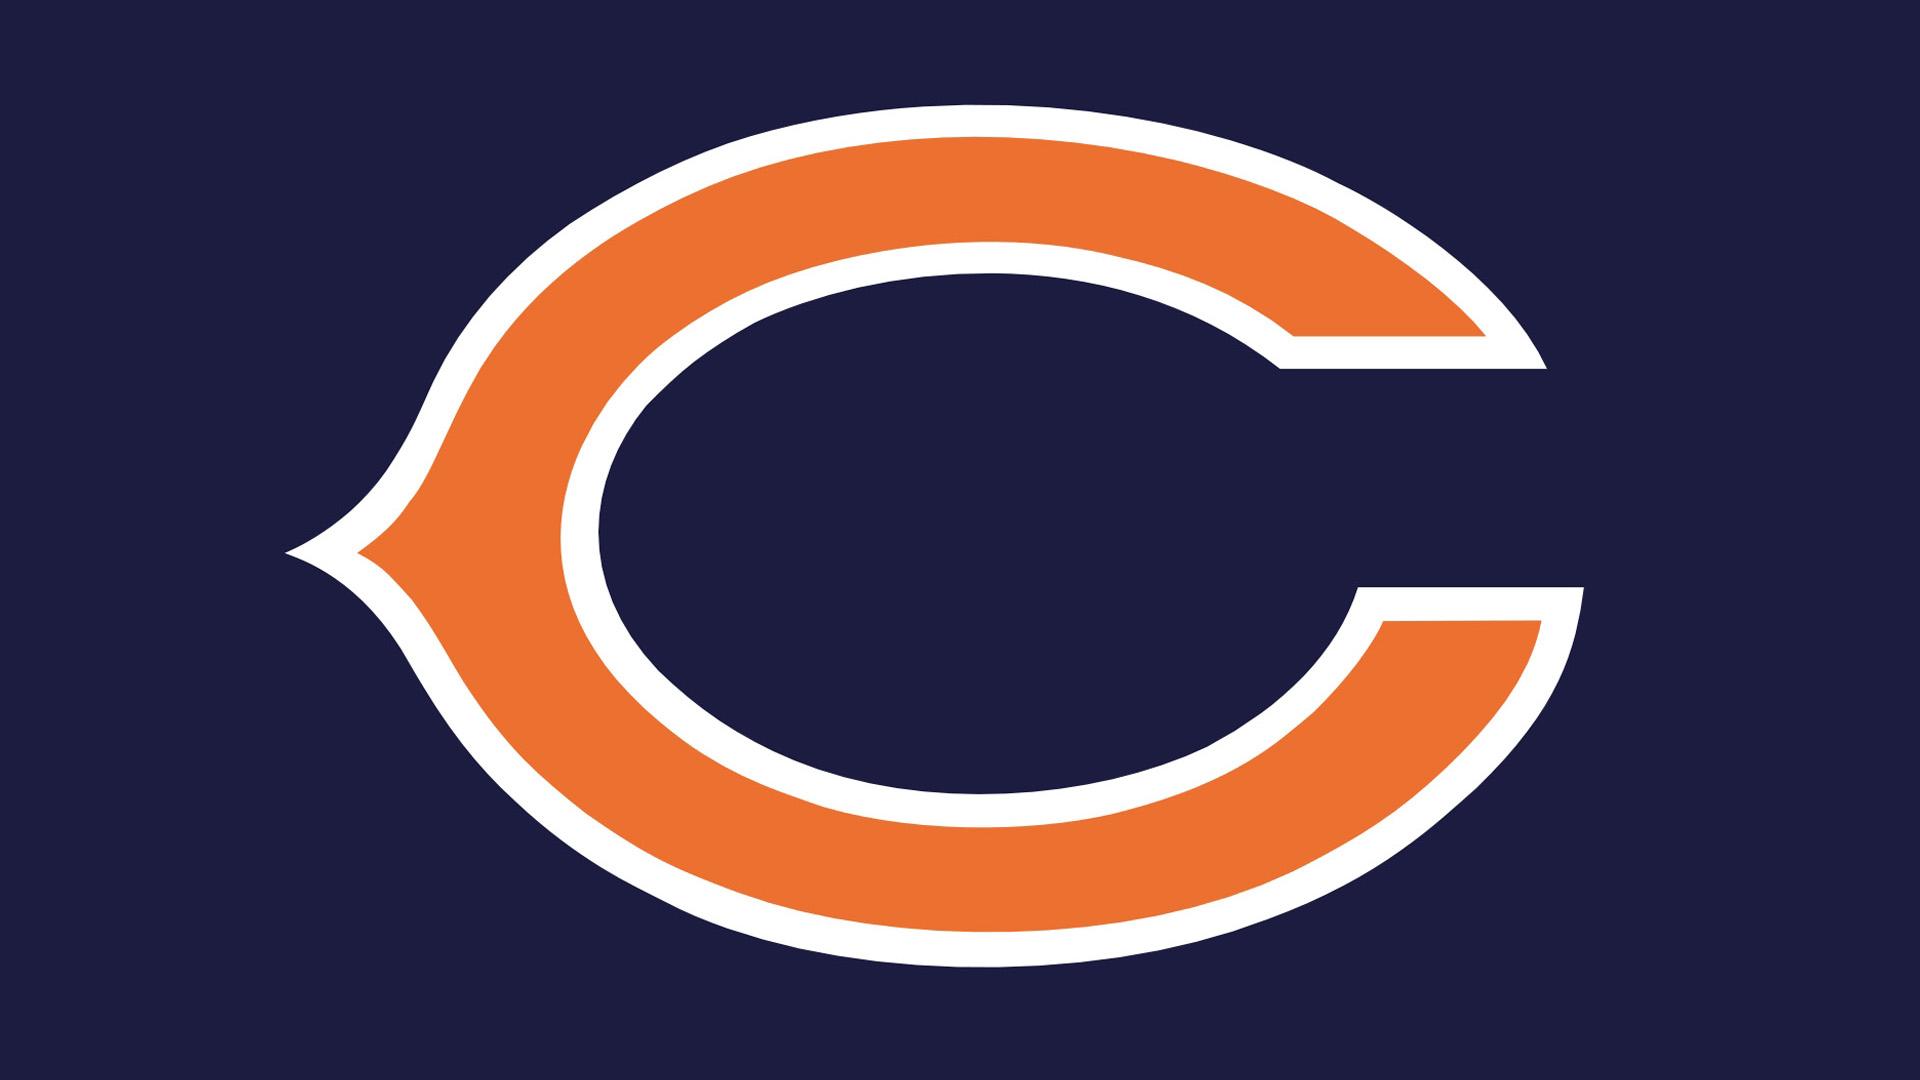 Chicago Bears wallpaper   314777 1920x1080